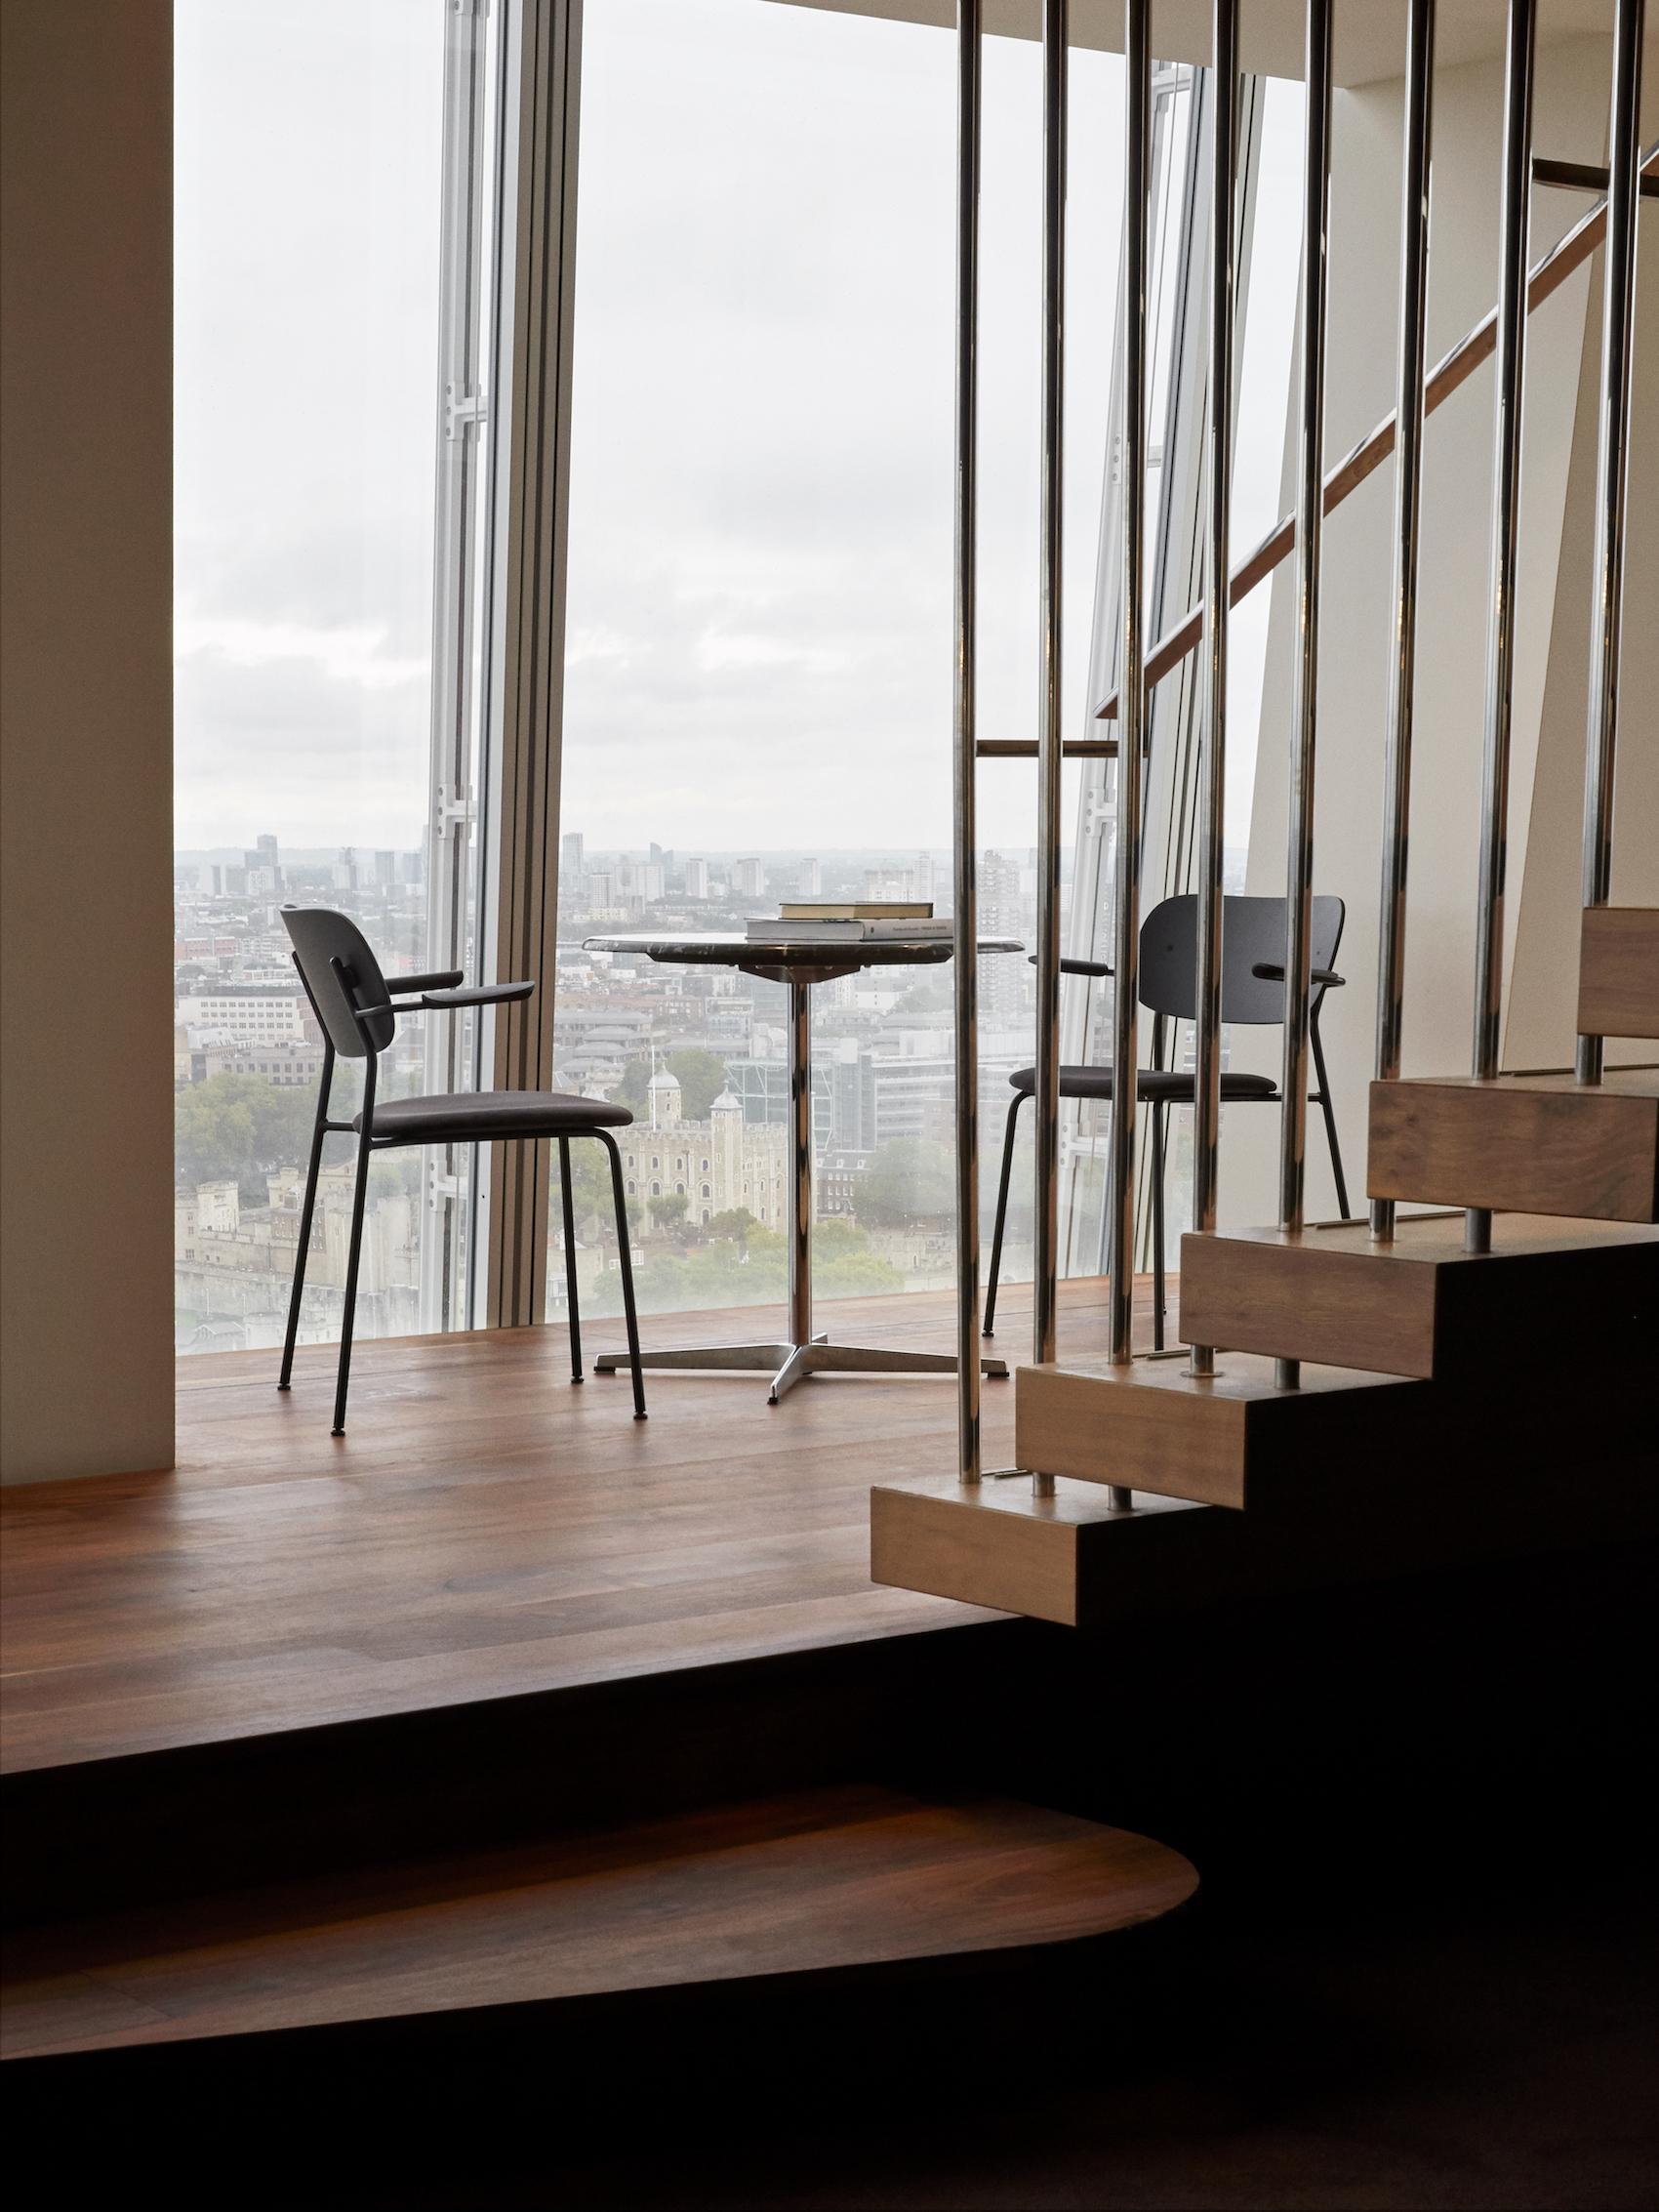 Co Chair The Lab Menu, modern furniture, chair, scandinavian design, scandinavian home The Chard project 4.jpg